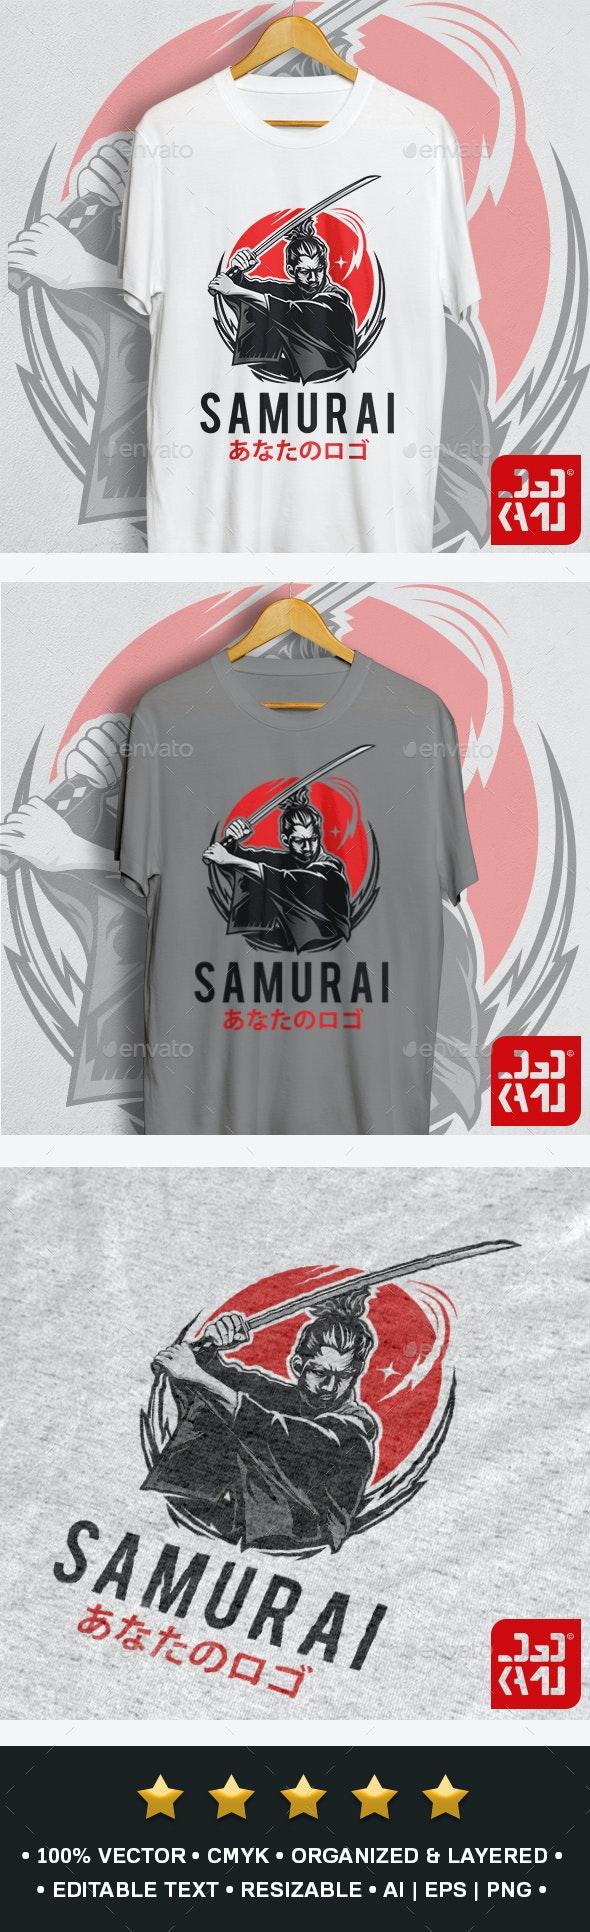 Samurai T-Shirt - Designs T-Shirts